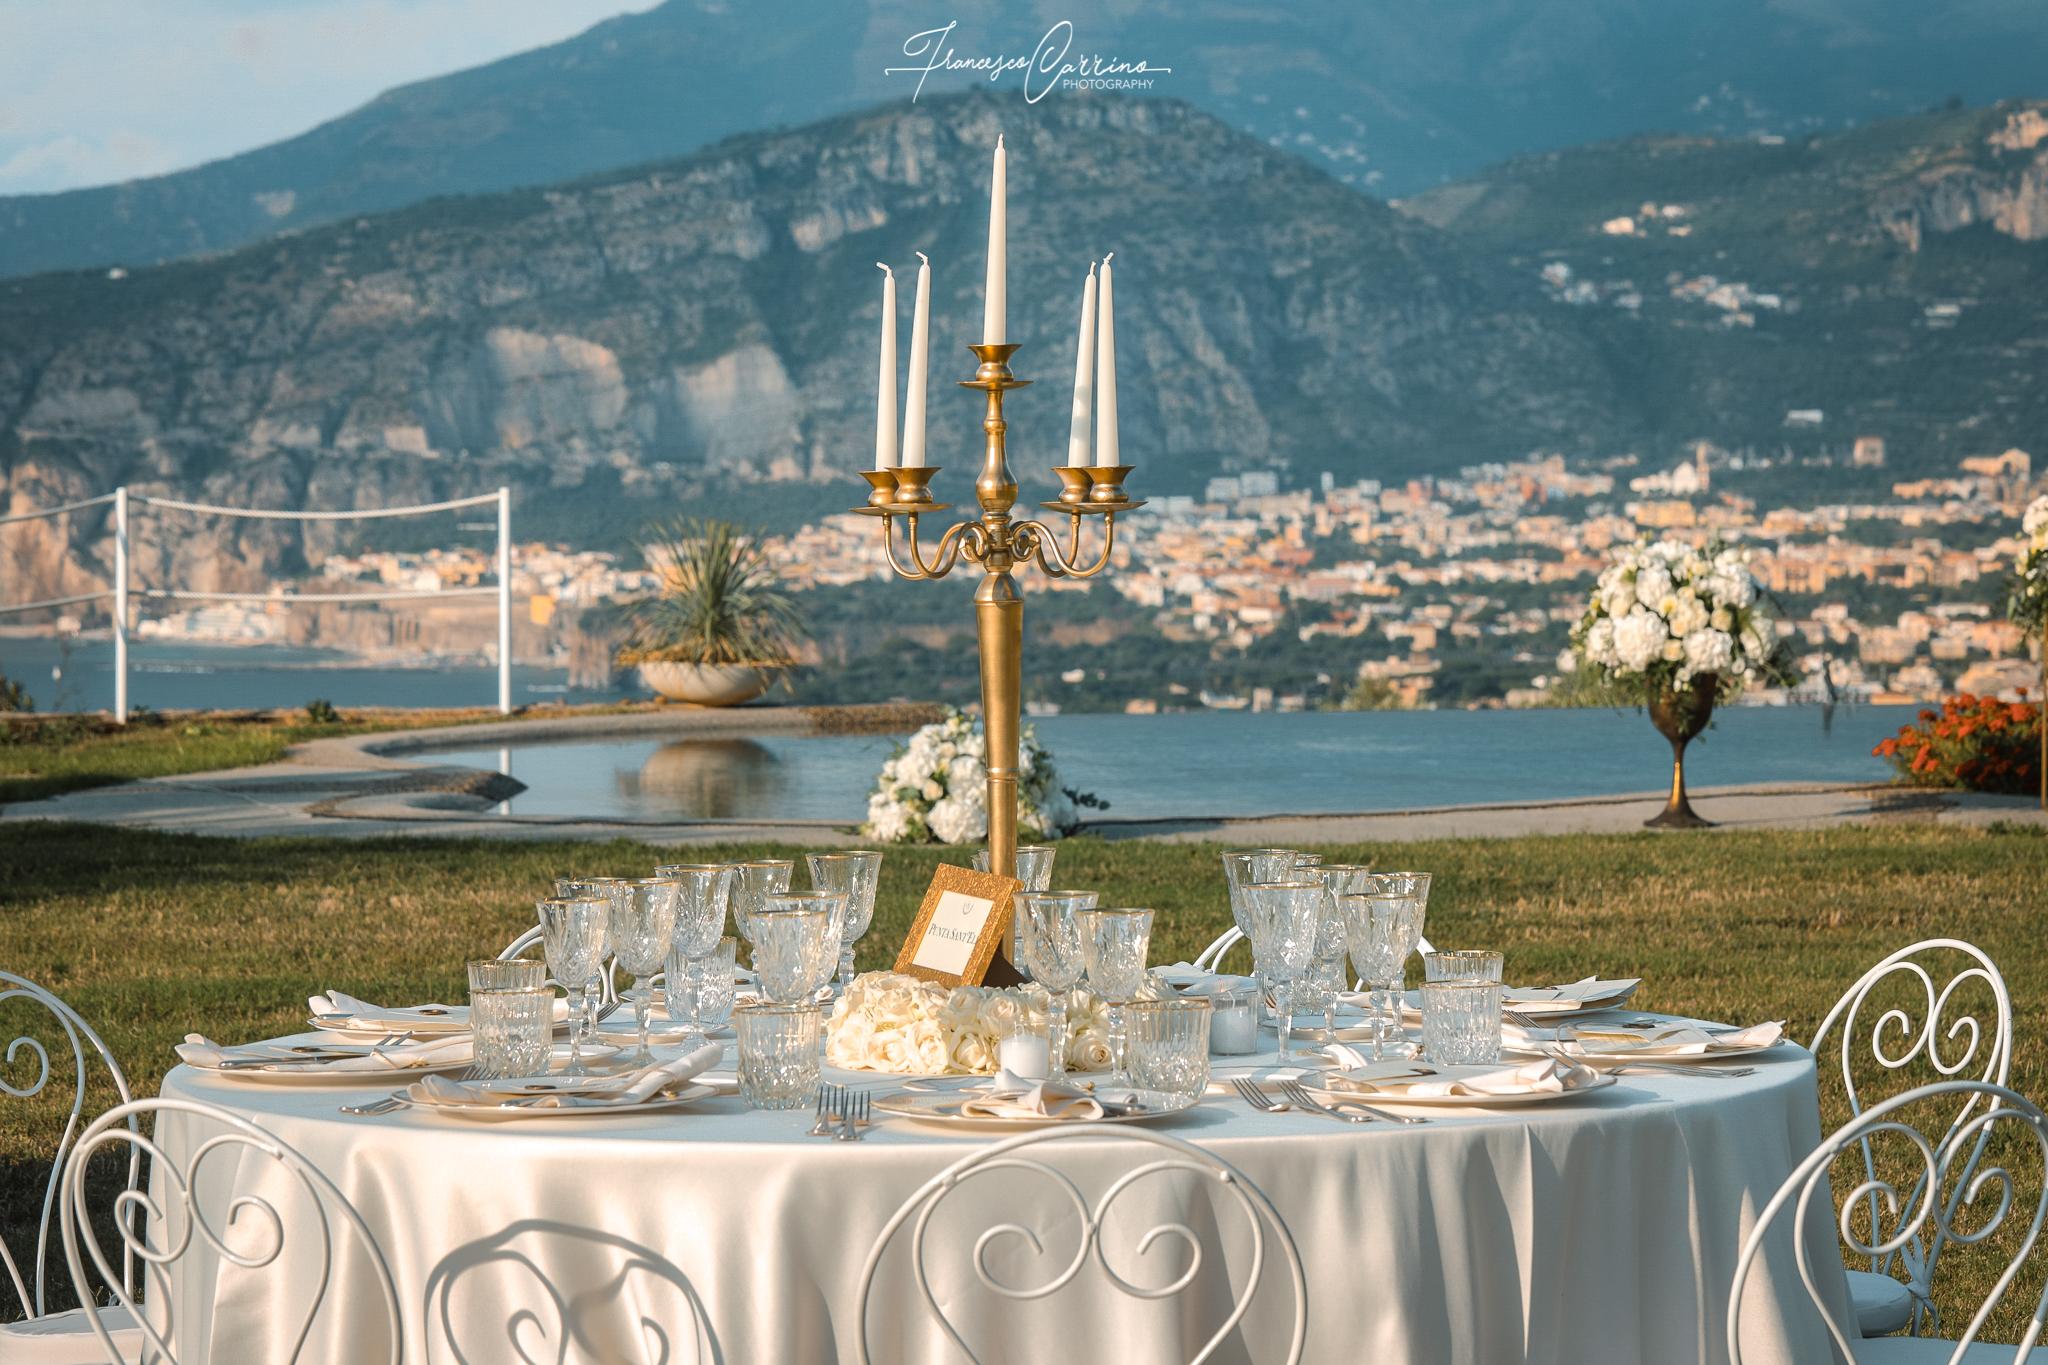 https://www.weddingamalfi.com/wp-content/uploads/Giannenza-13-luglio-2019-6.jpg